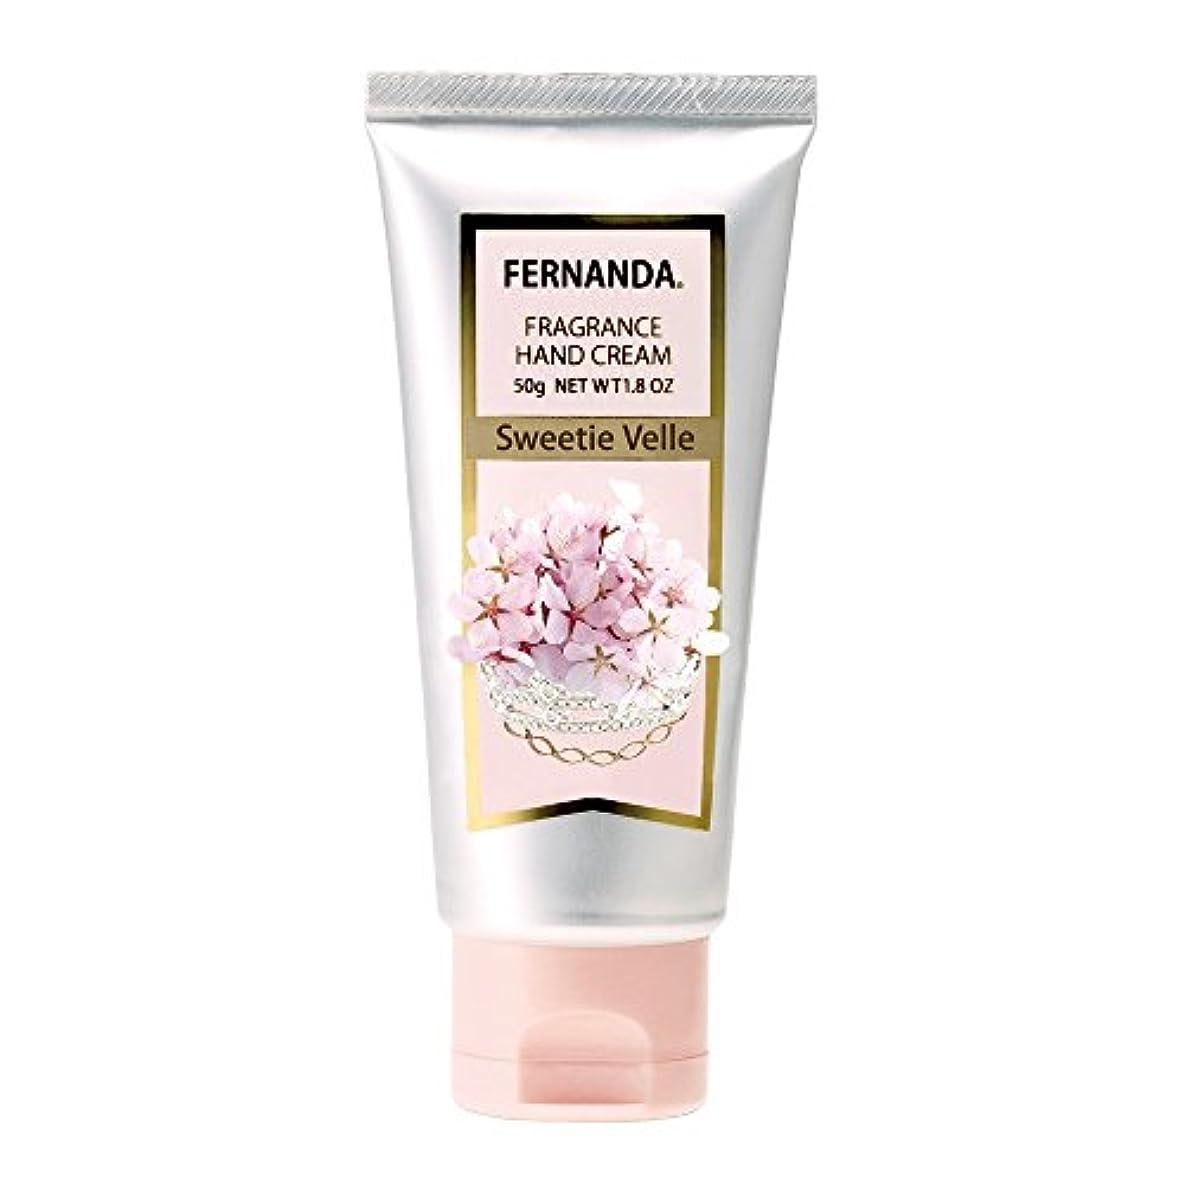 FERNANDA(フェルナンダ) Hand Cream Sweetie Velle(ハンドクリーム スウィティーベル)